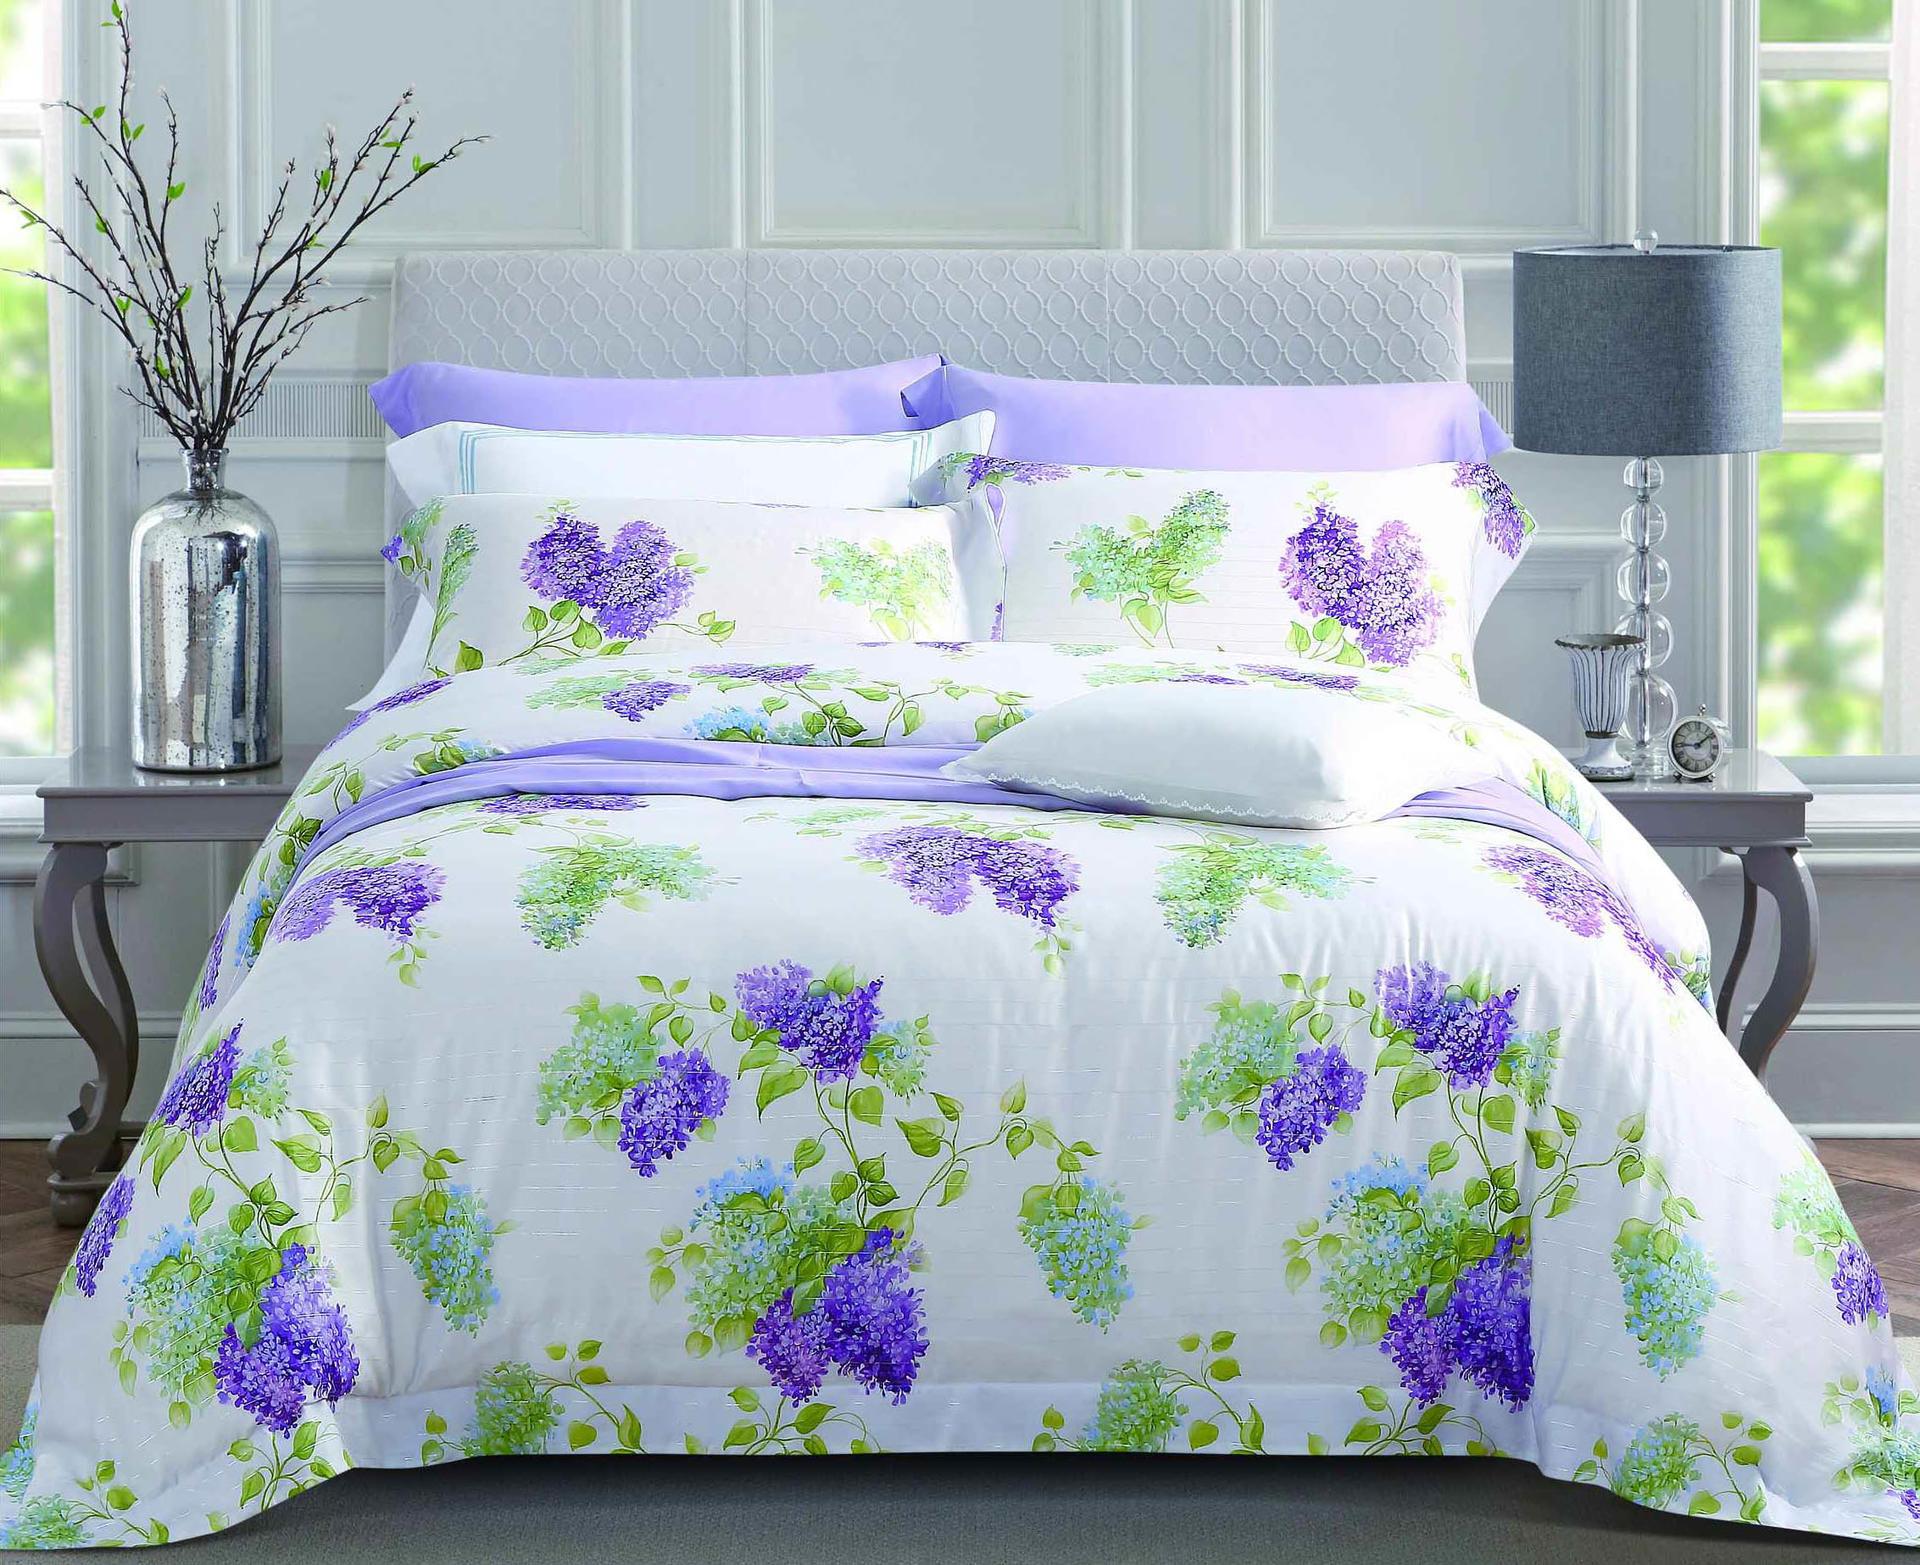 Daphne Brand duvet healthy custom modal sheets